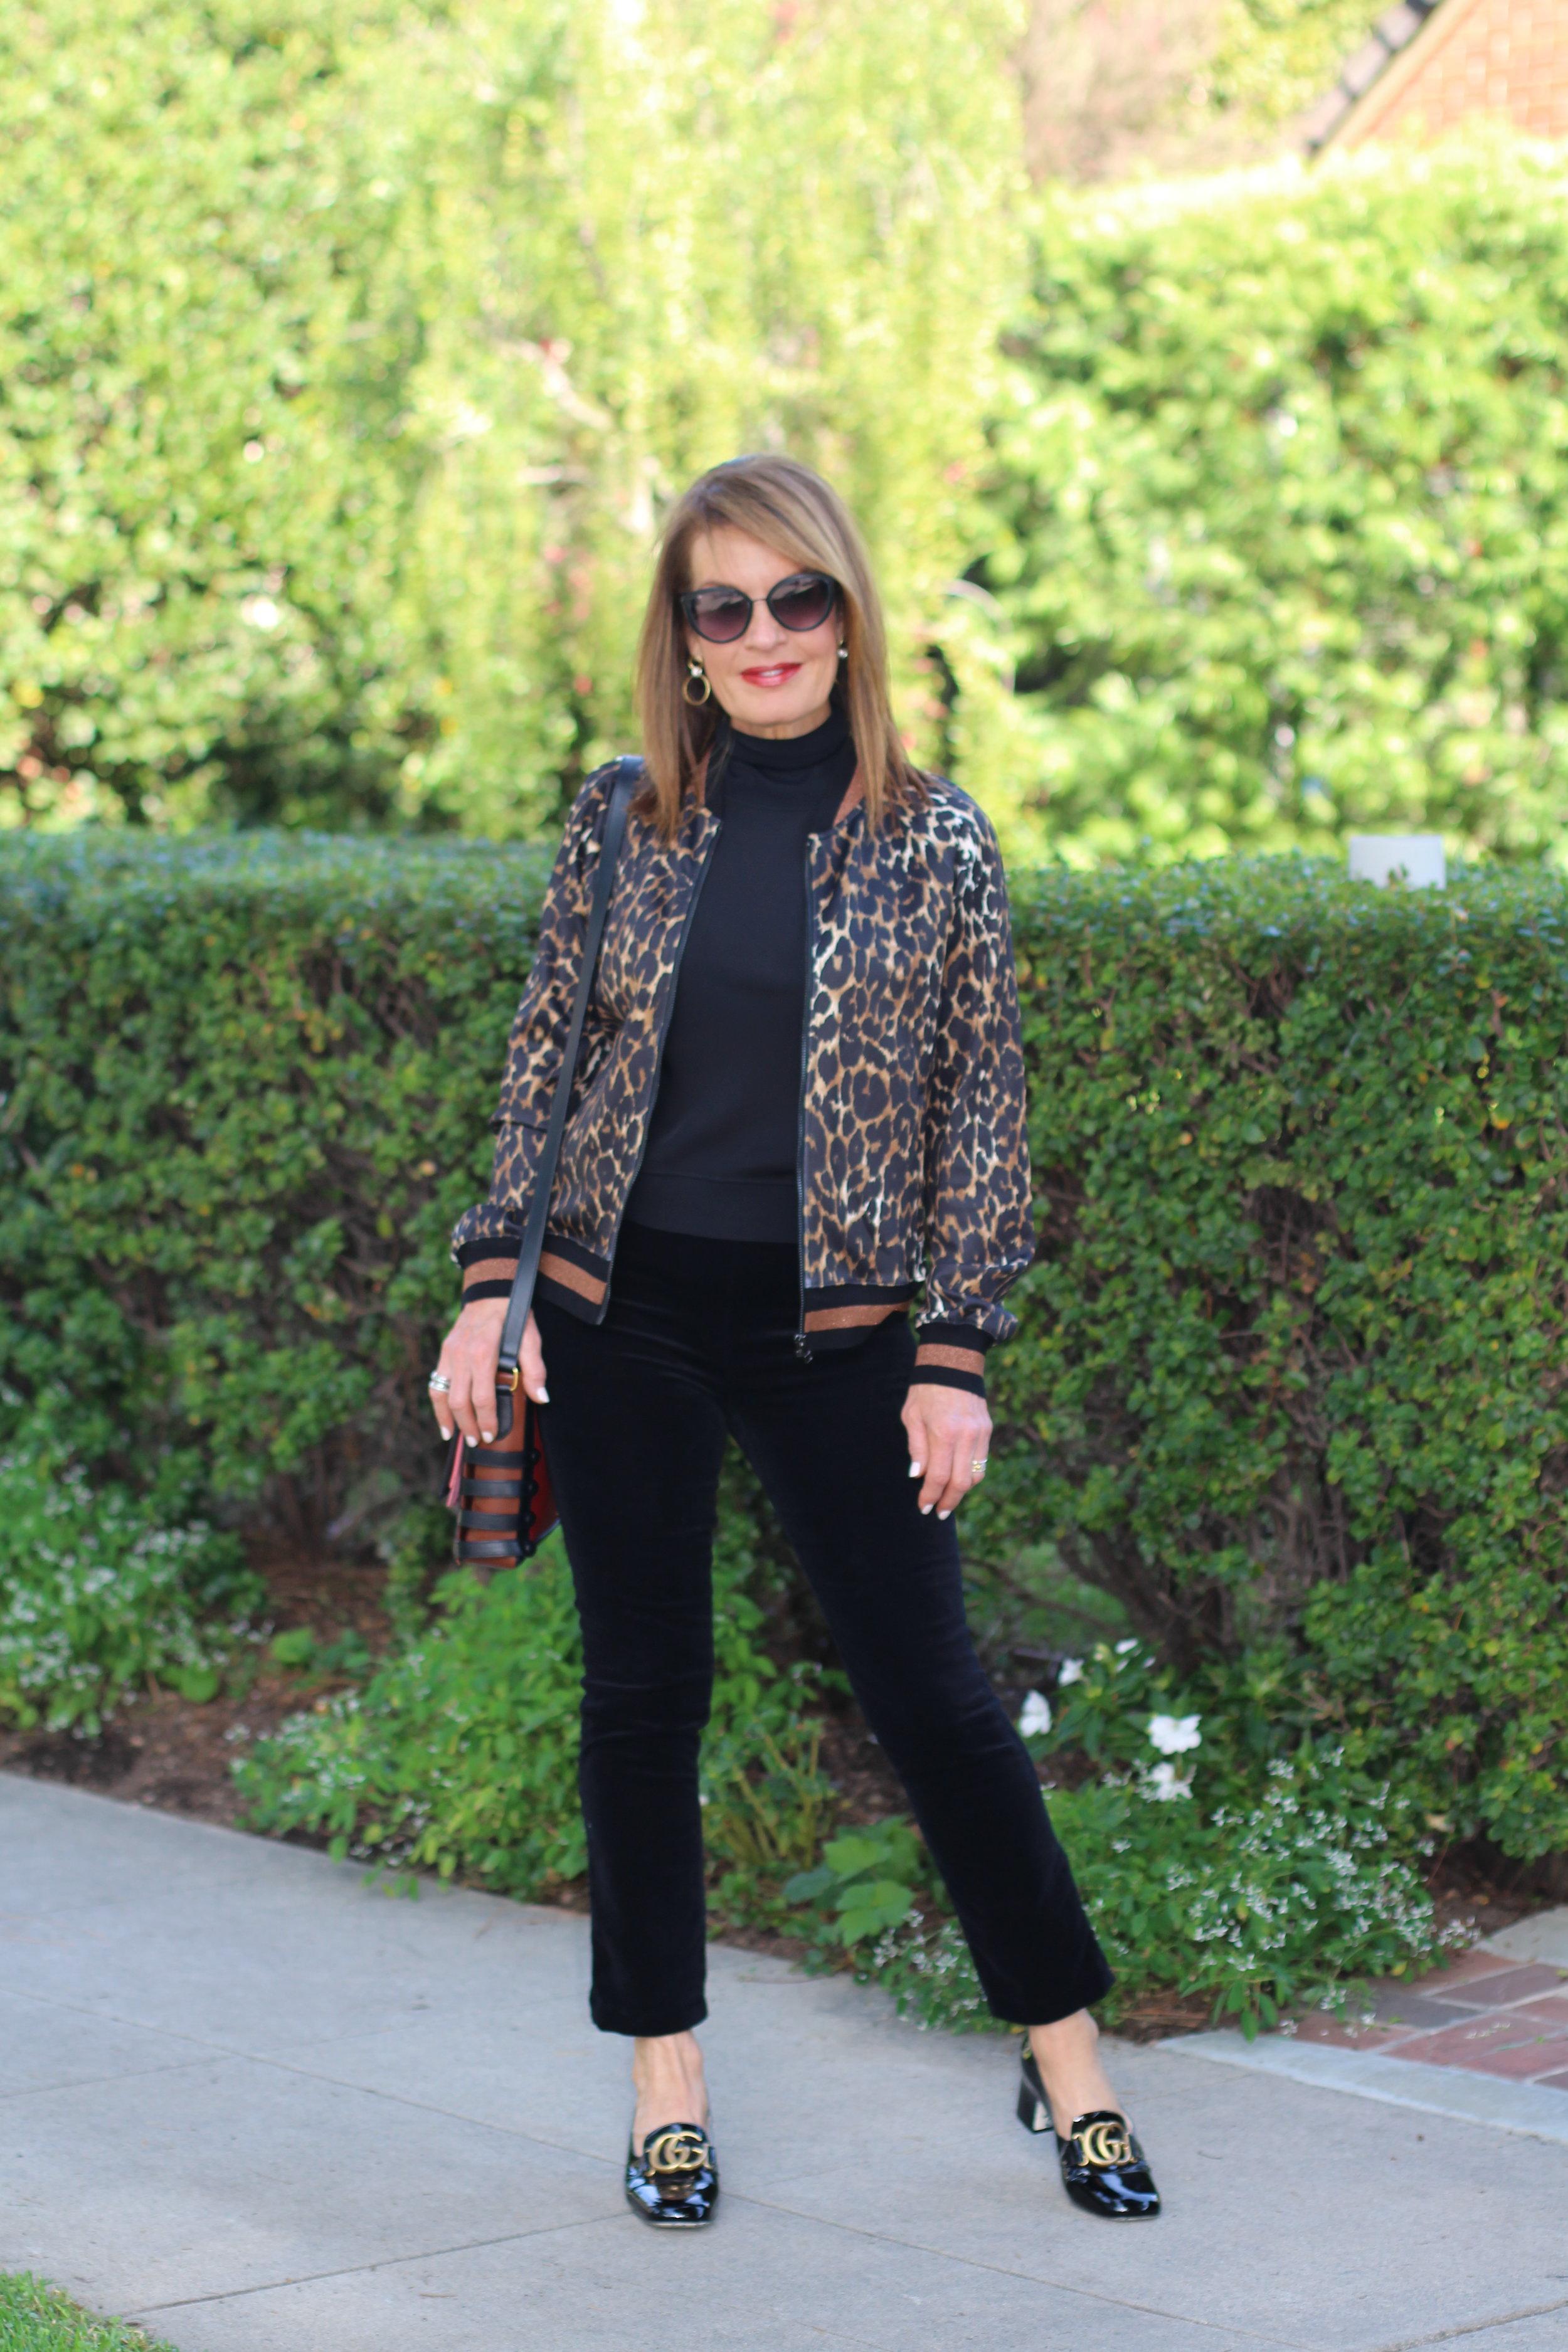 Pam and Gela jacket   , Theory top,    J Brand velvet pants   ,    Gucci shoes   , Christian Louboutin handbag,    Chanel Sunglasses   , Madewell earrings